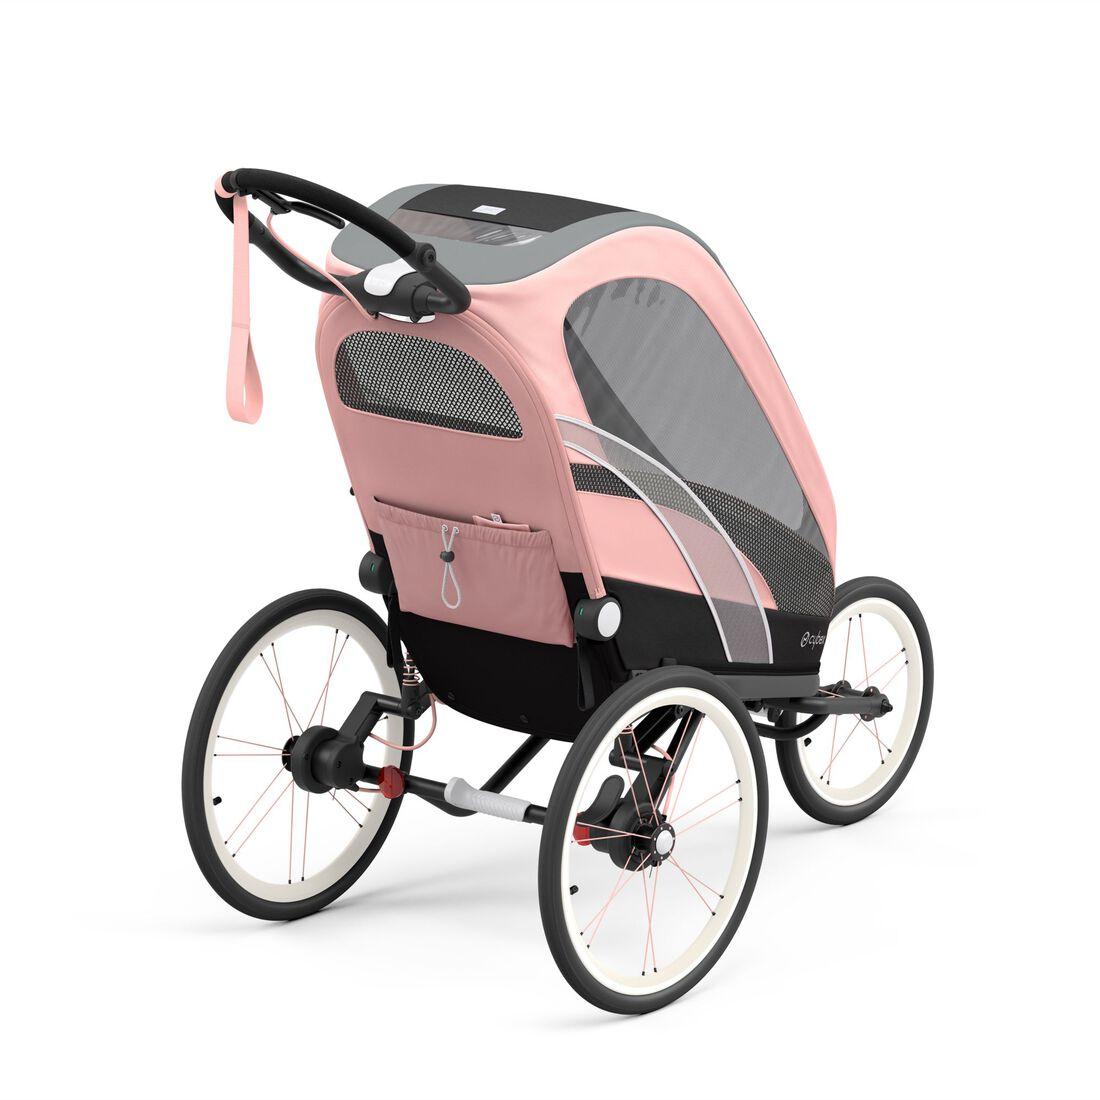 CYBEX Zeno Sitzpaket - Silver Pink in Silver Pink large Bild 5